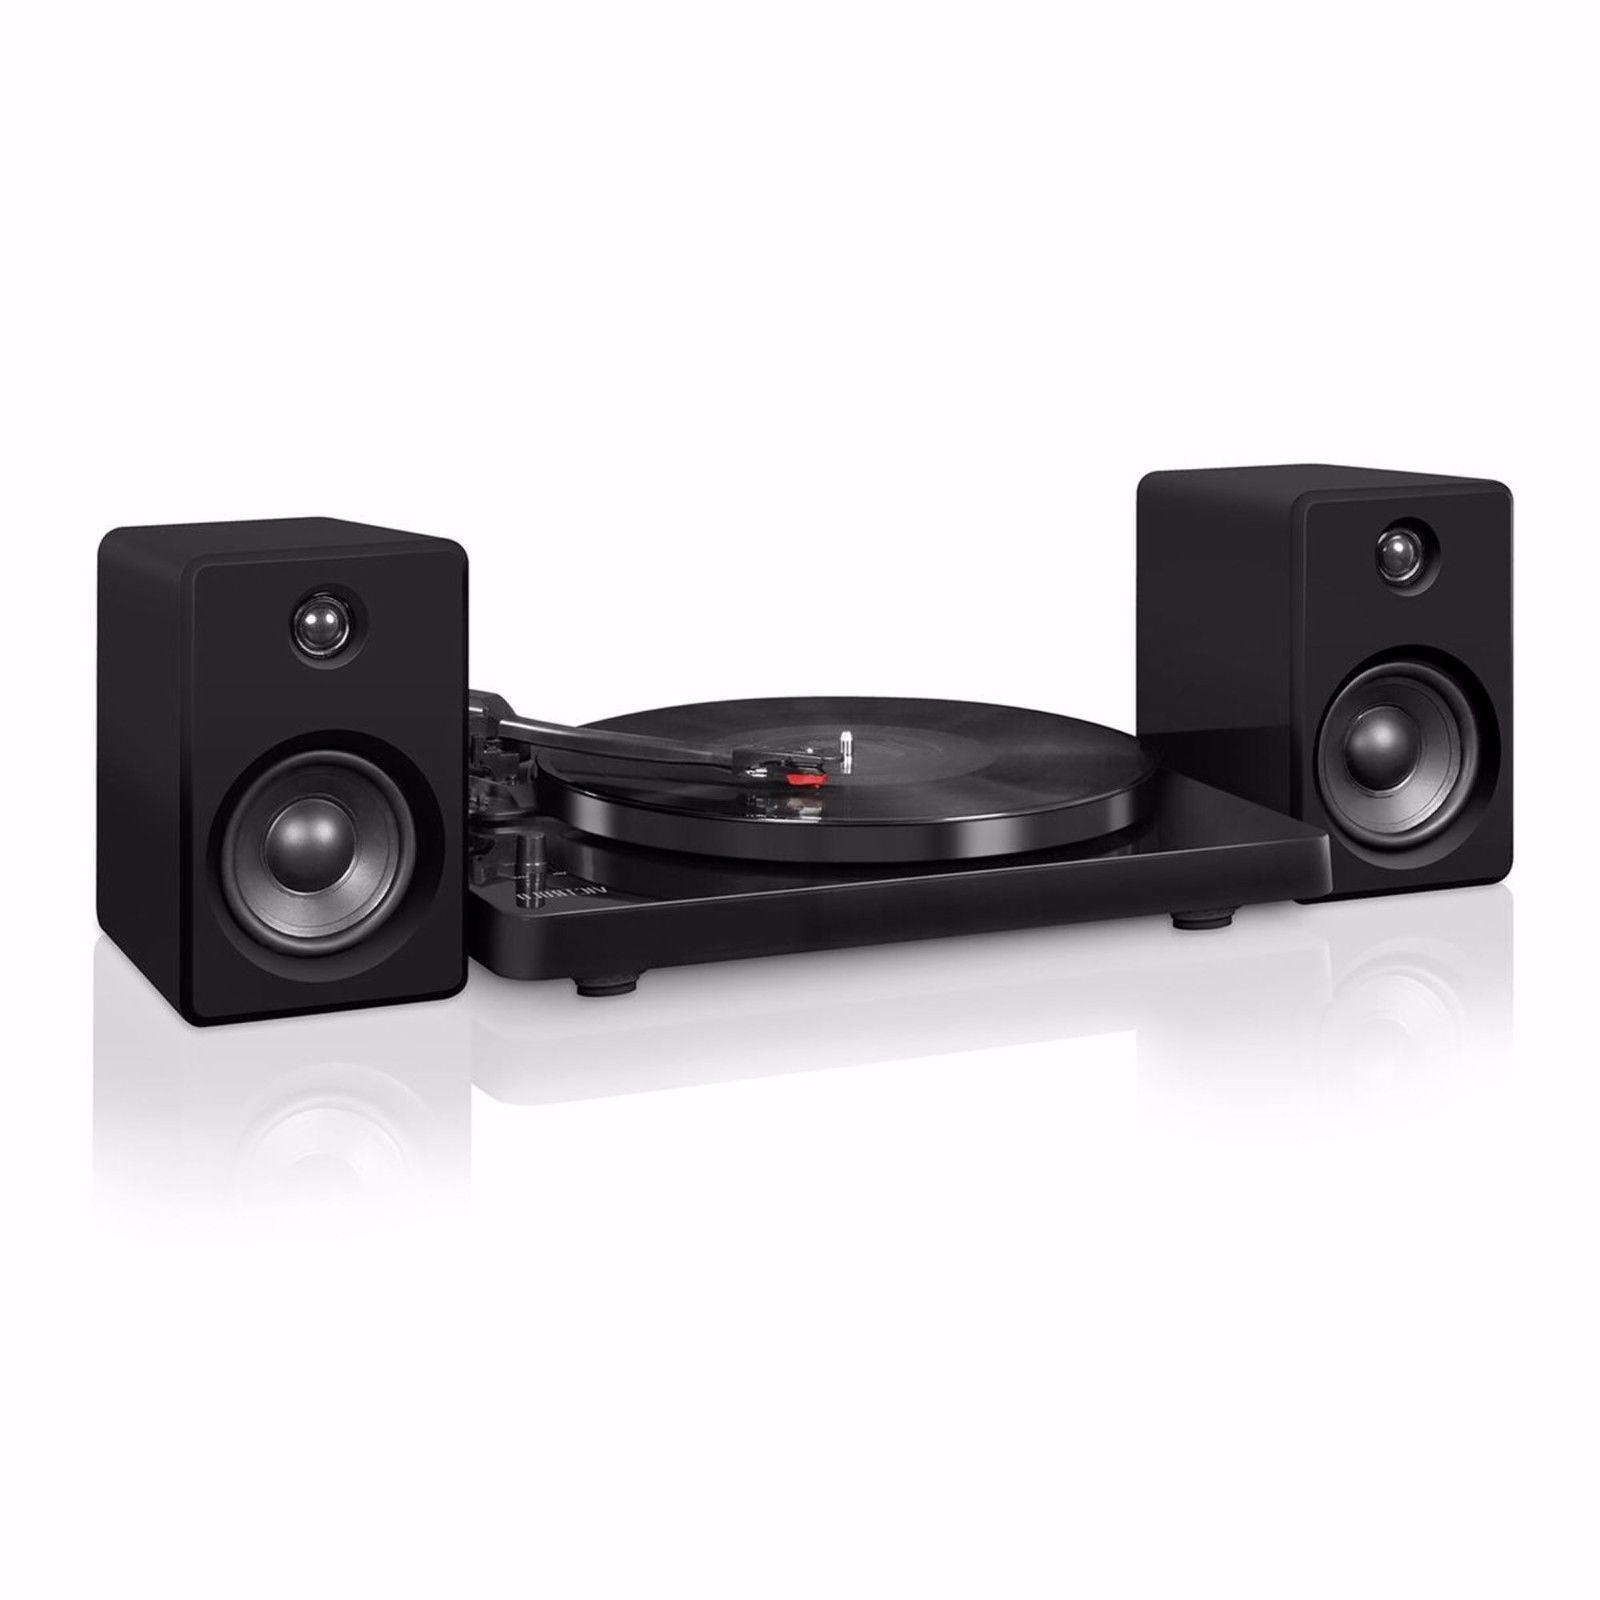 Stereo Audio System High-gloss Black